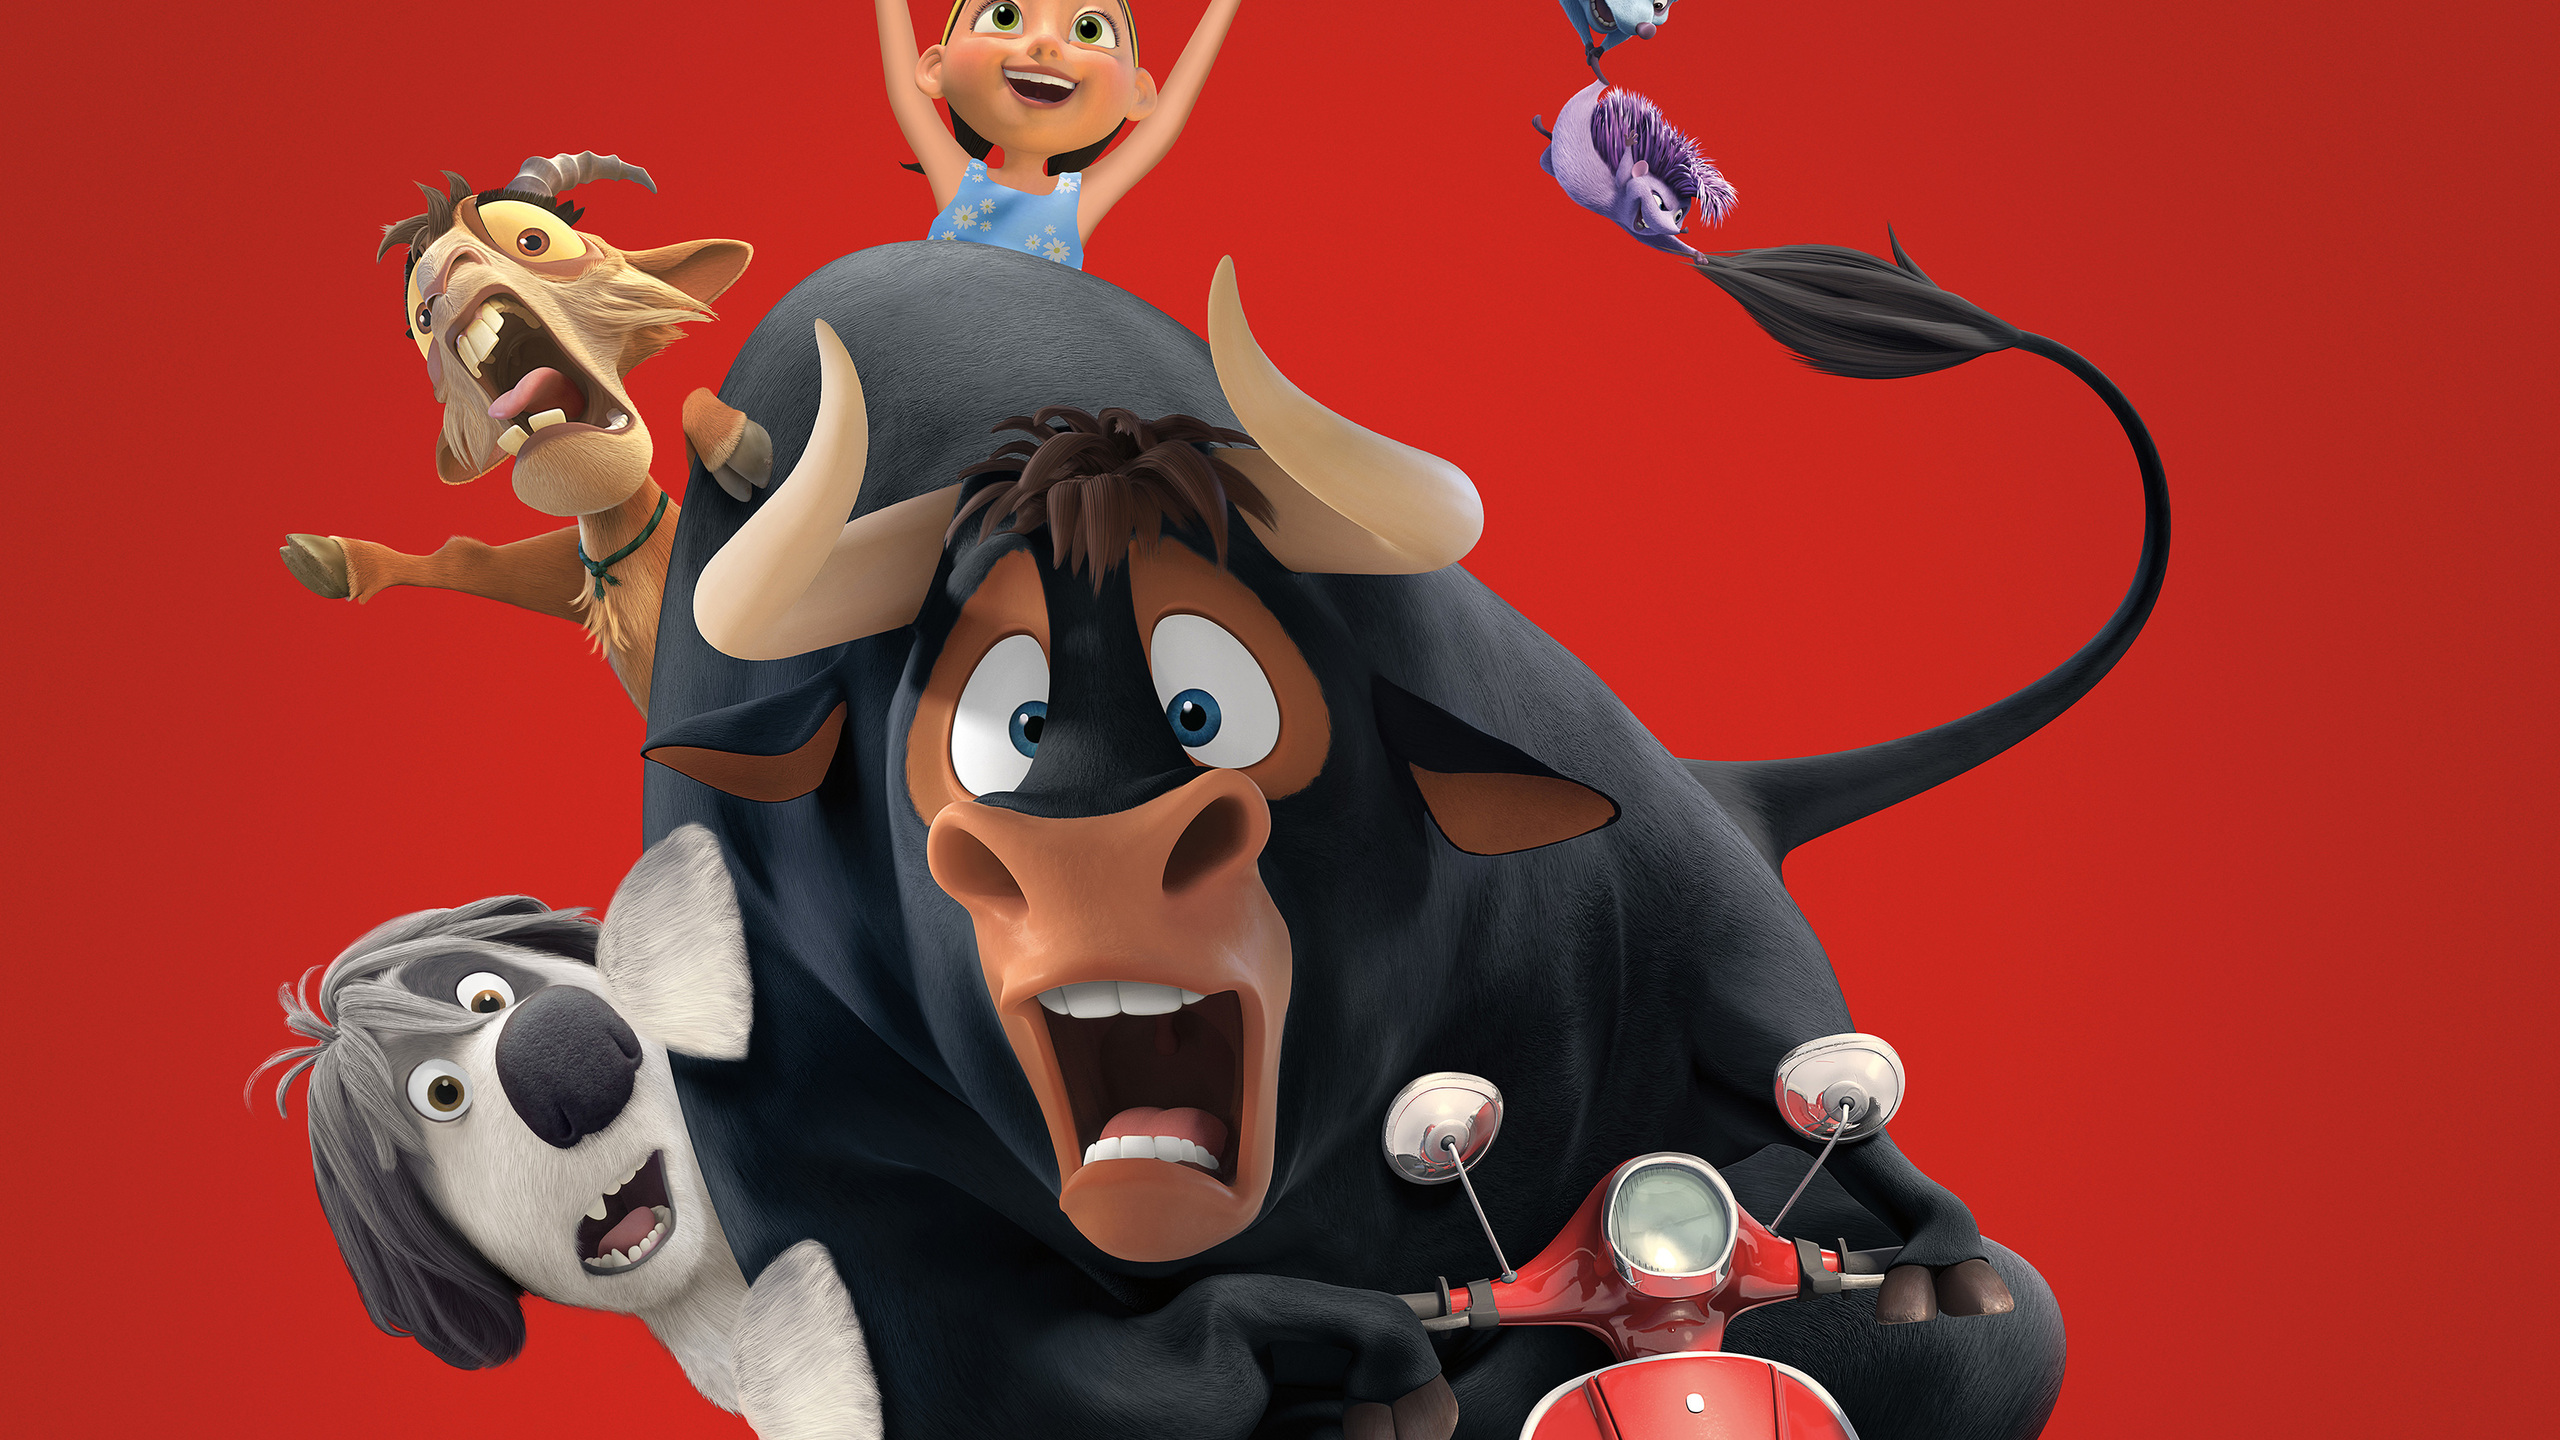 2560x1440 Ferdinand Best Animated Movie Of 2017 4k 1440p